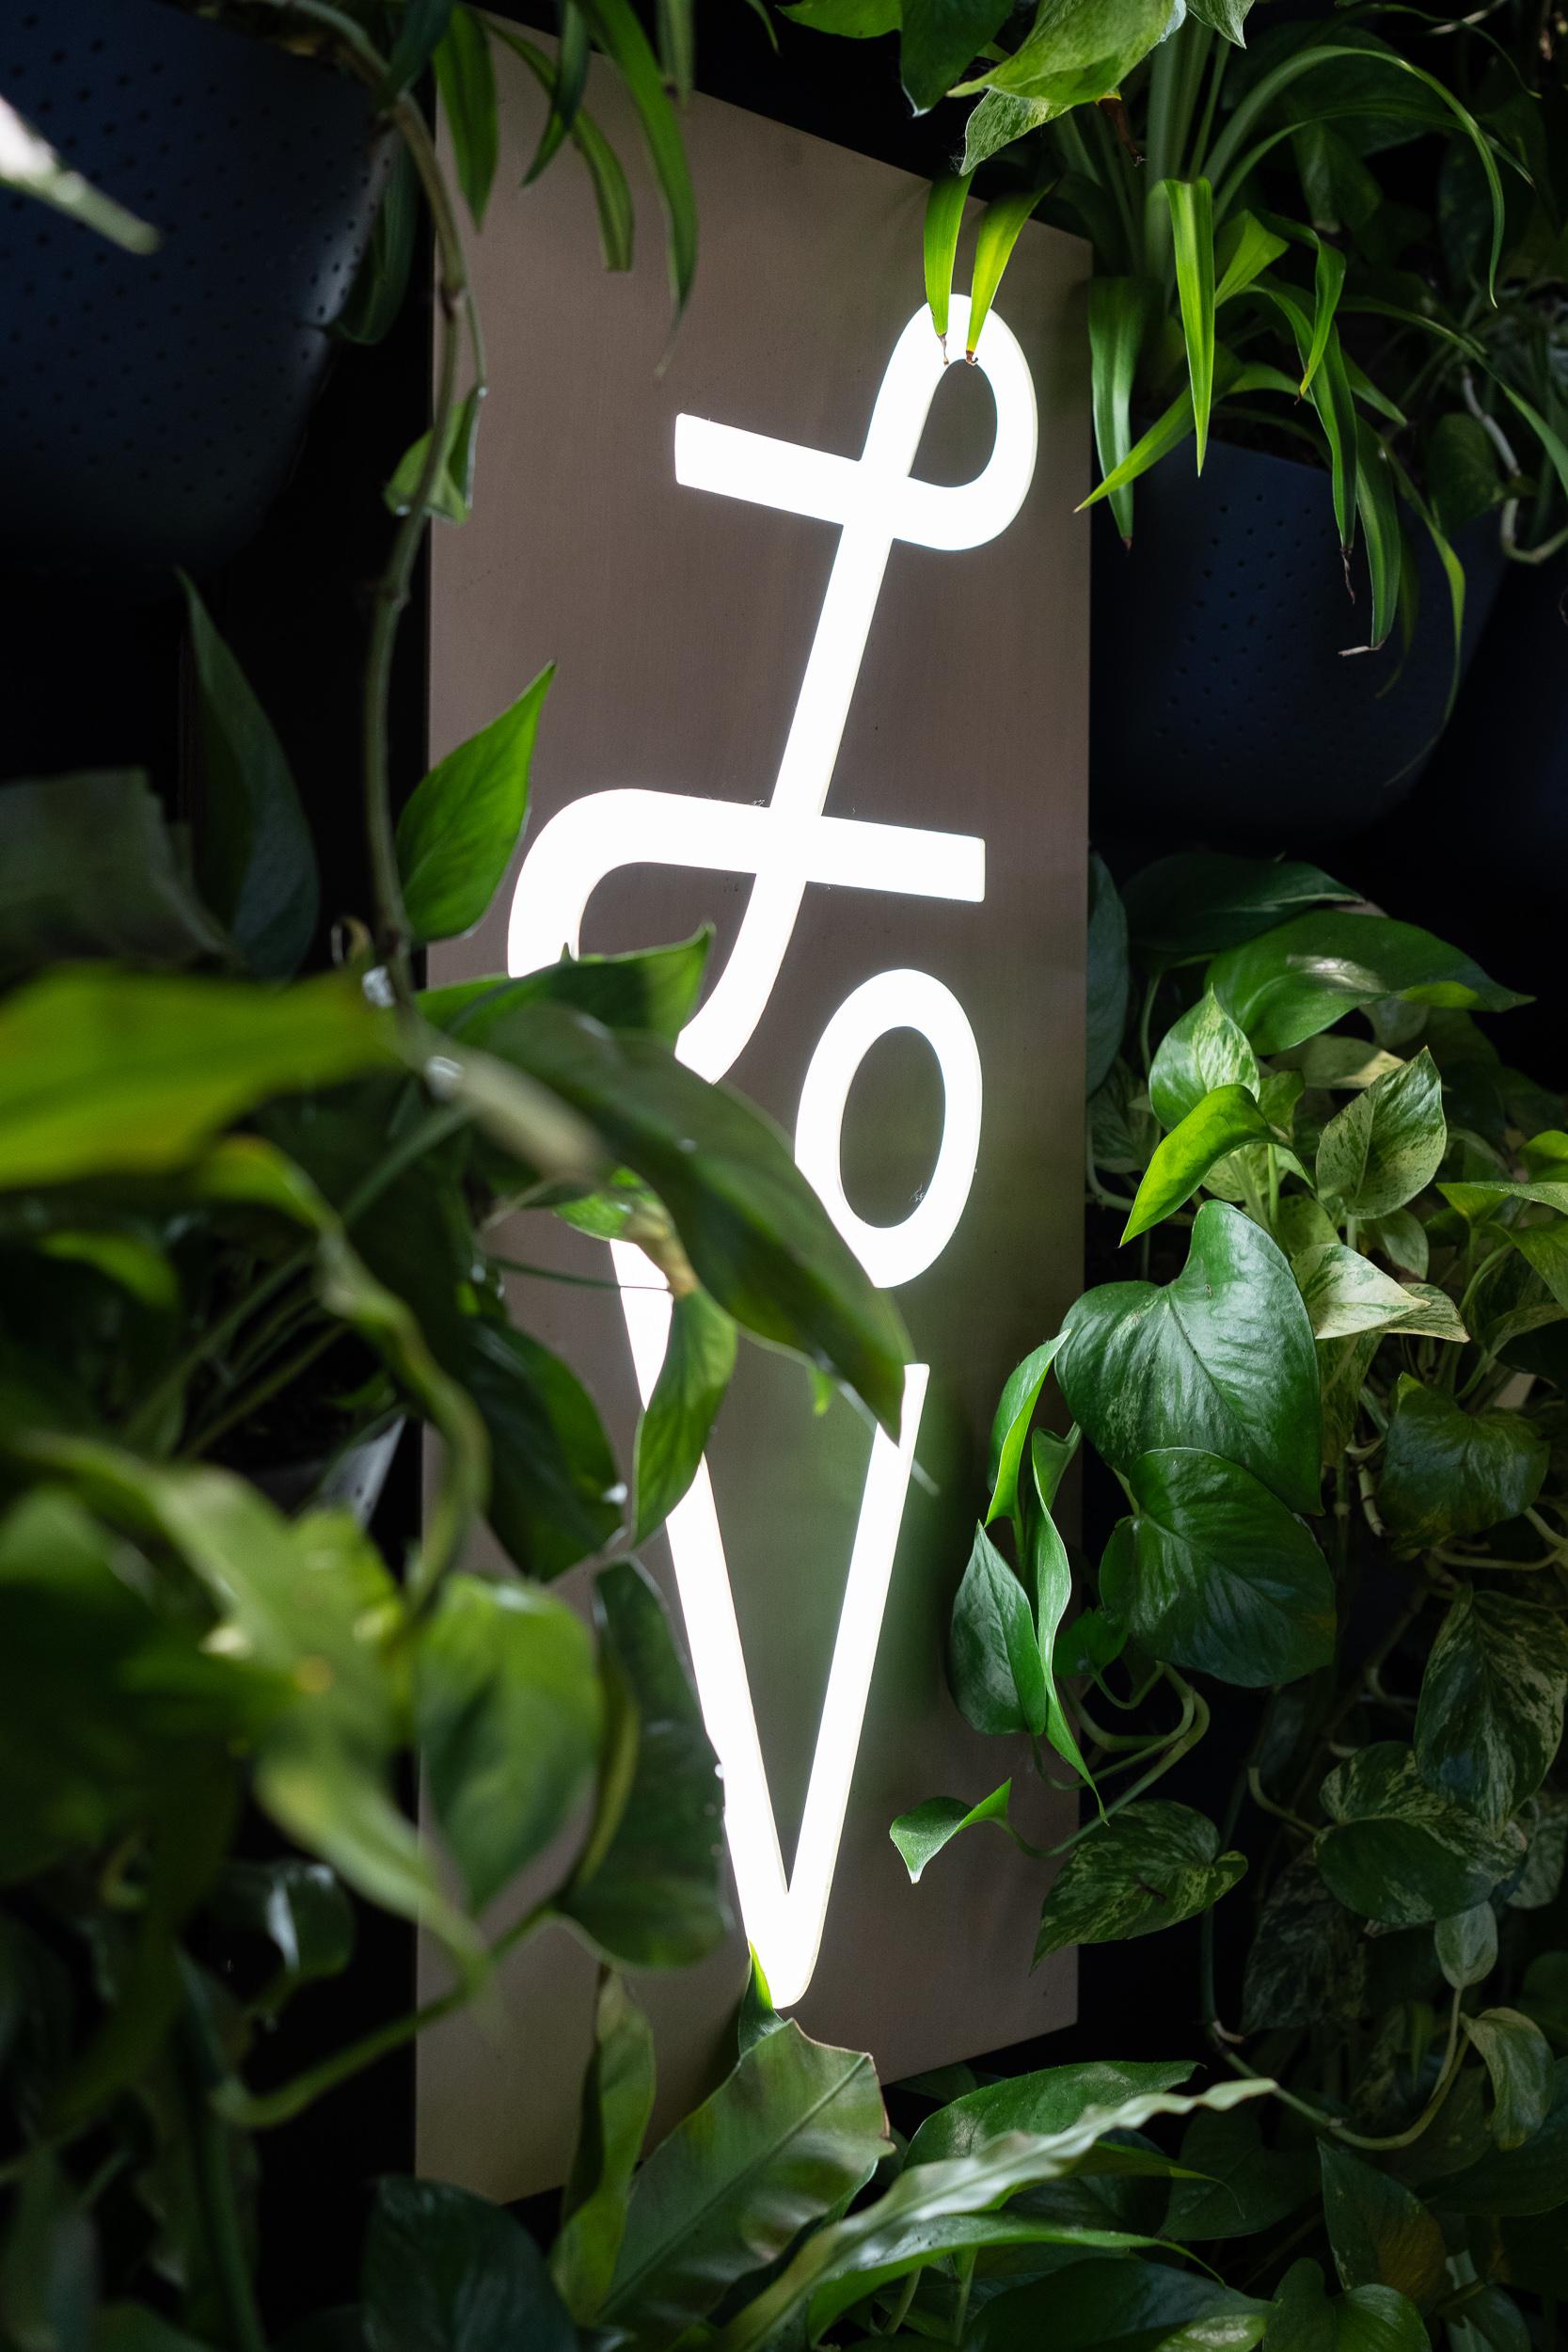 We love this illuminated sign.